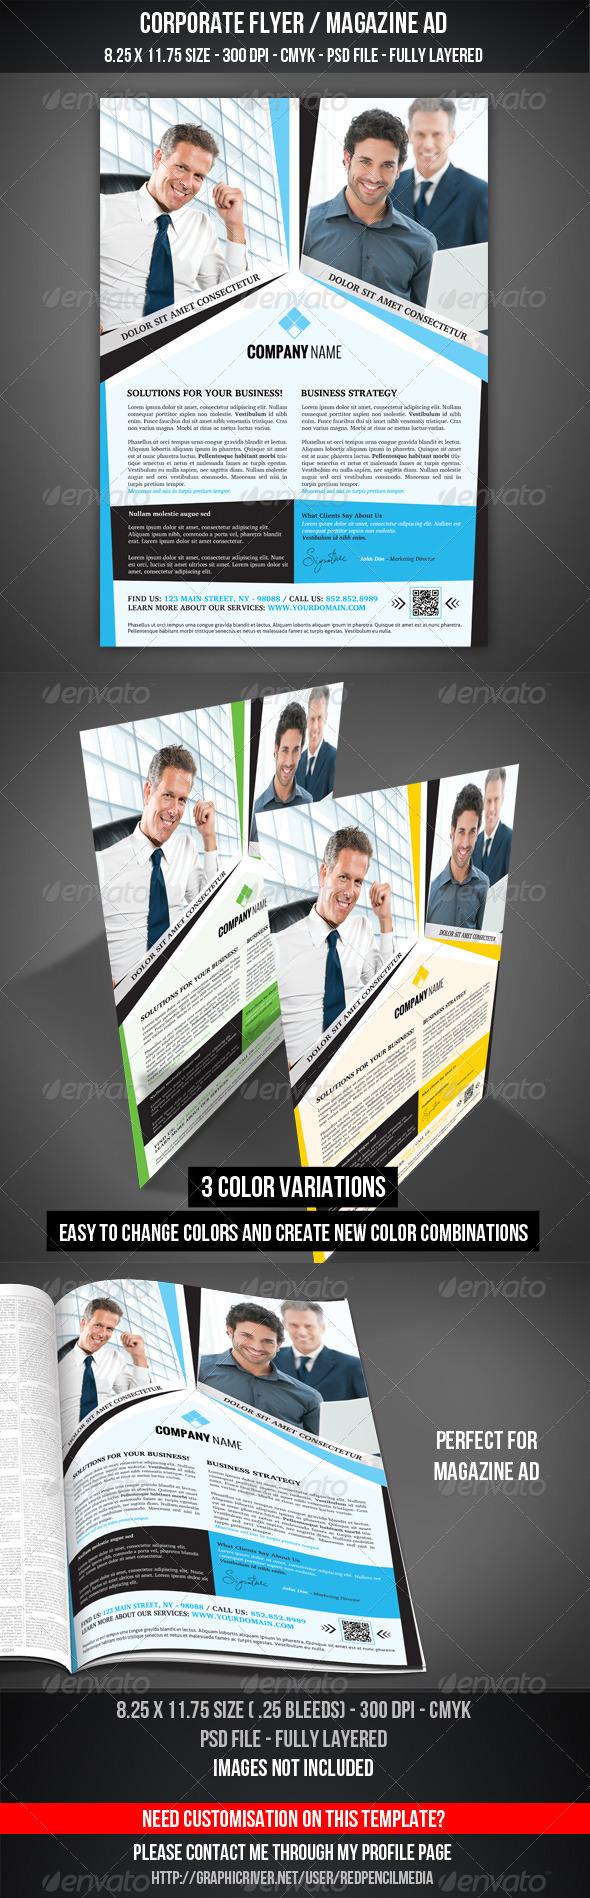 Corporate Flyer / Magazine AD - Corporate Flyers